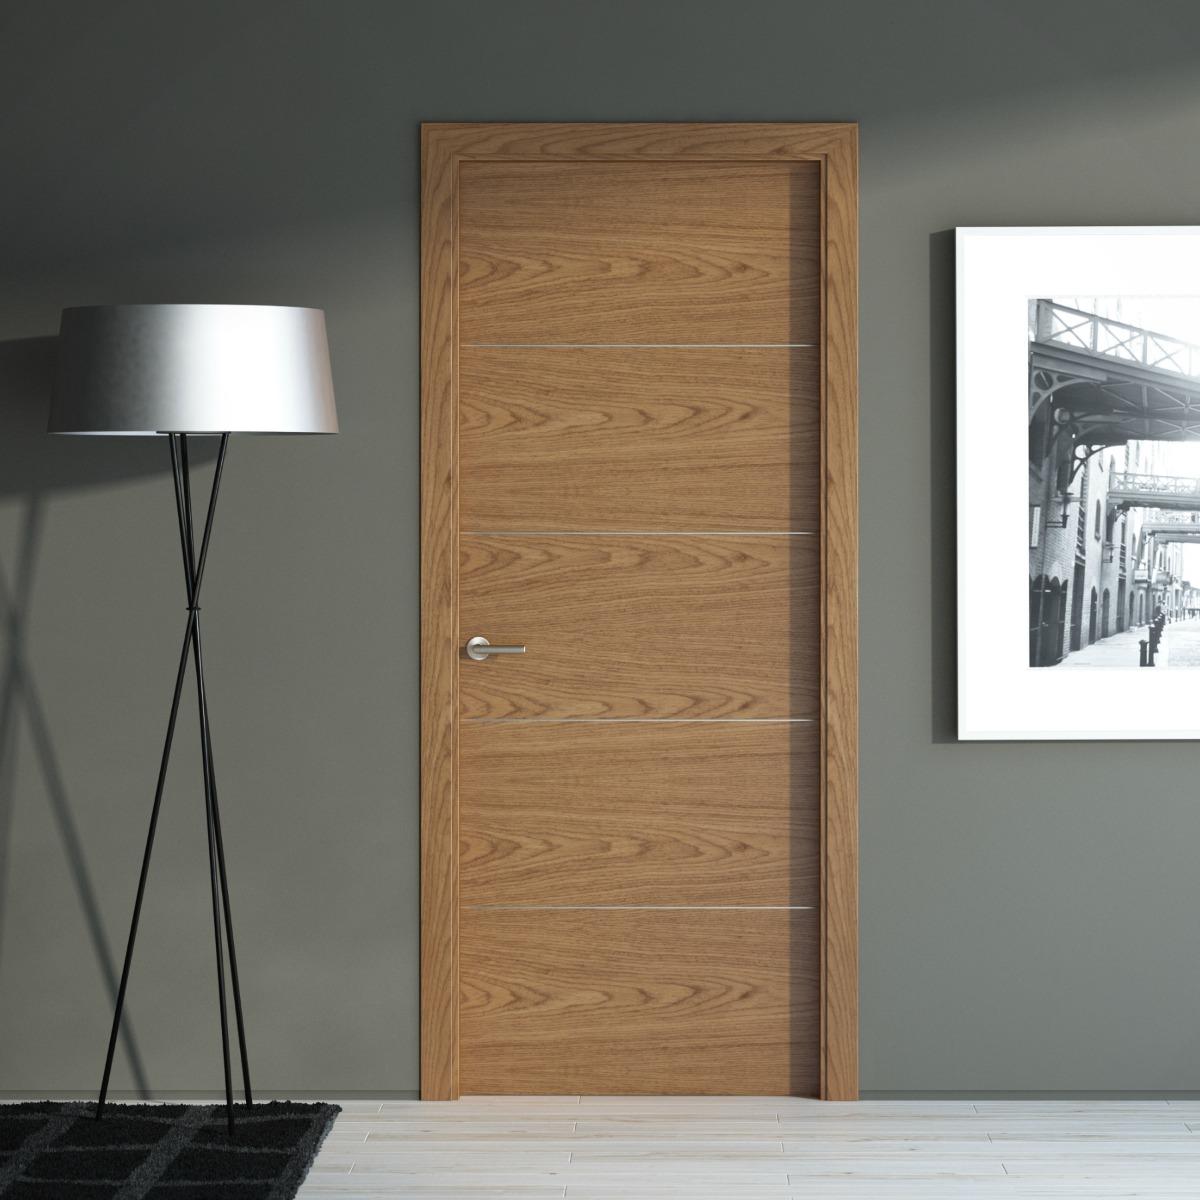 Puertas a medida puertas madera coru a vetta grupo - Fotos para puertas ...